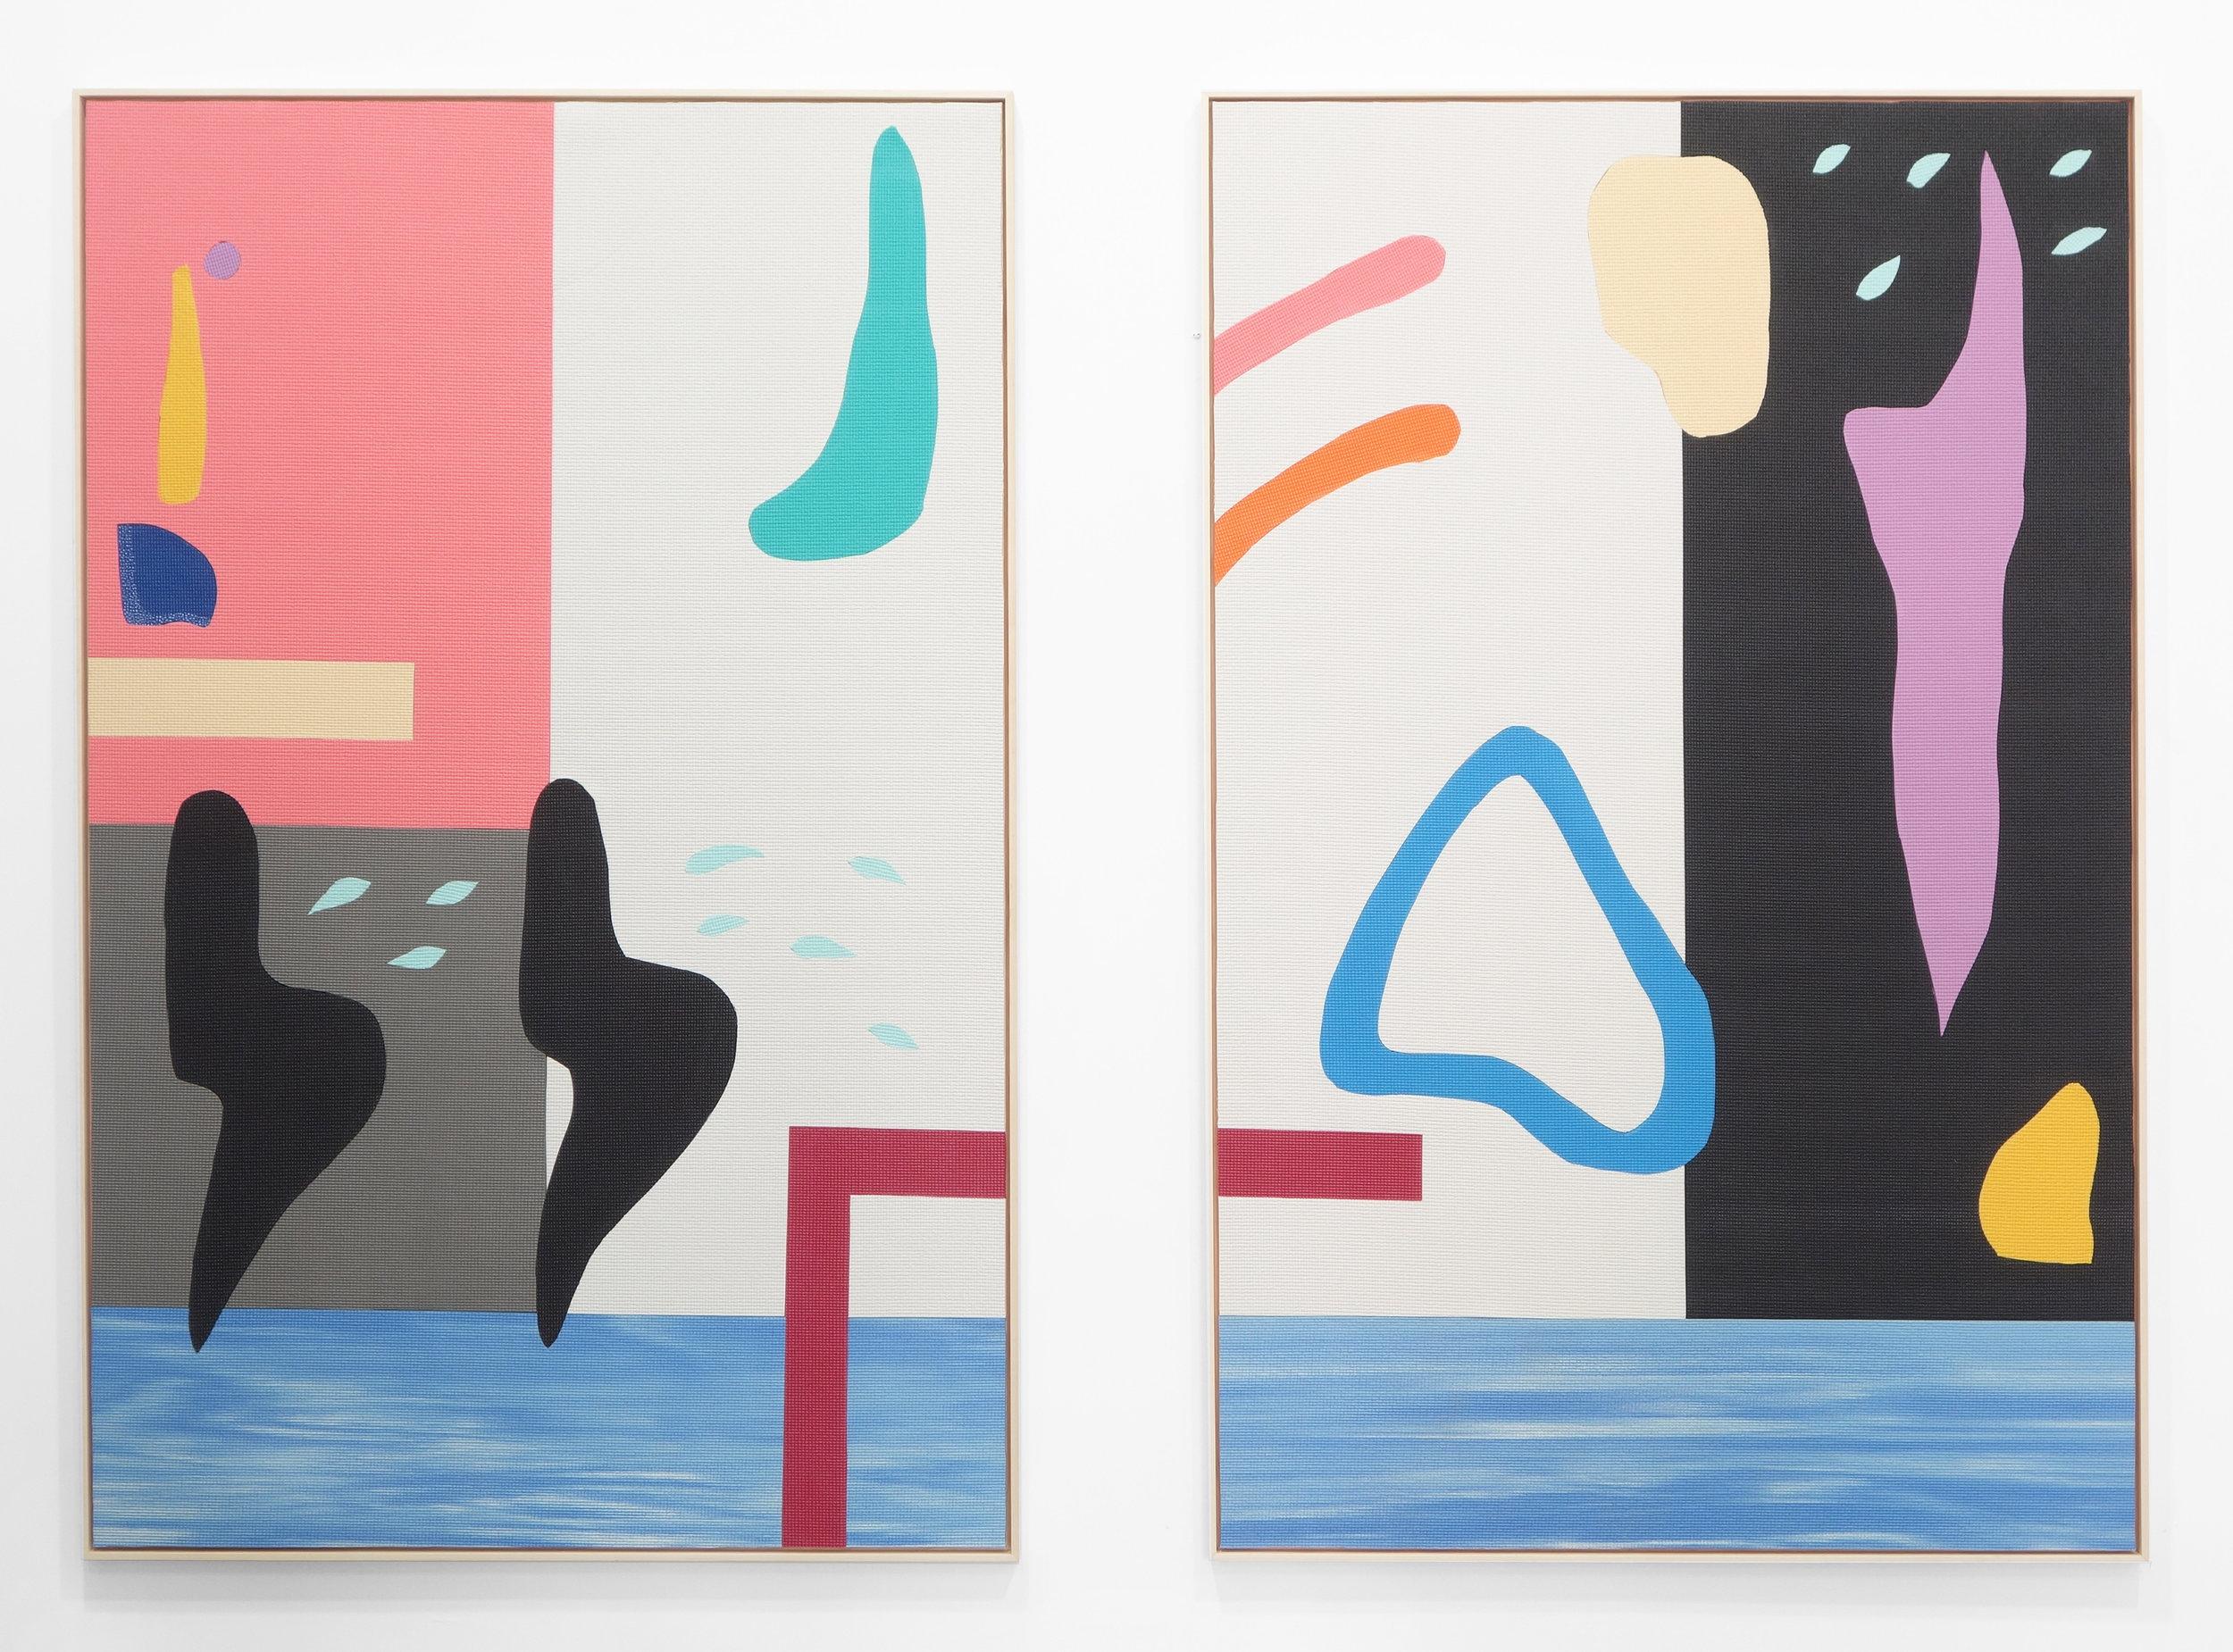 Gathering moon milk pair hand-cut PVC yoga mats on wood panel 72x48 inches each 2015